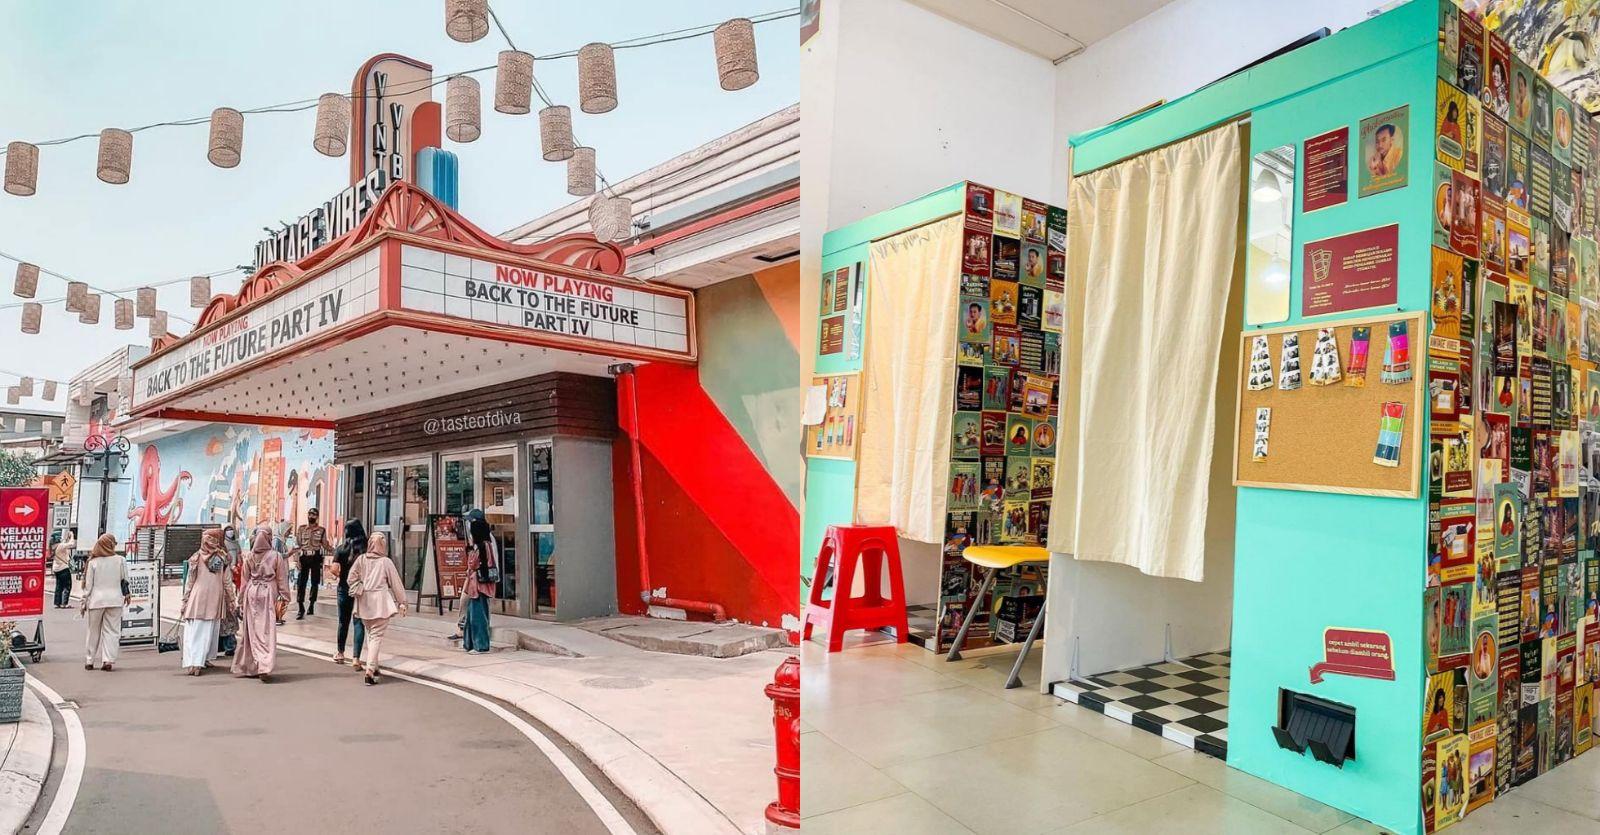 Vintage Vibes, Alam Sutra - Photobooth Photobox Kekinian Di Jakarta Dan Bandung